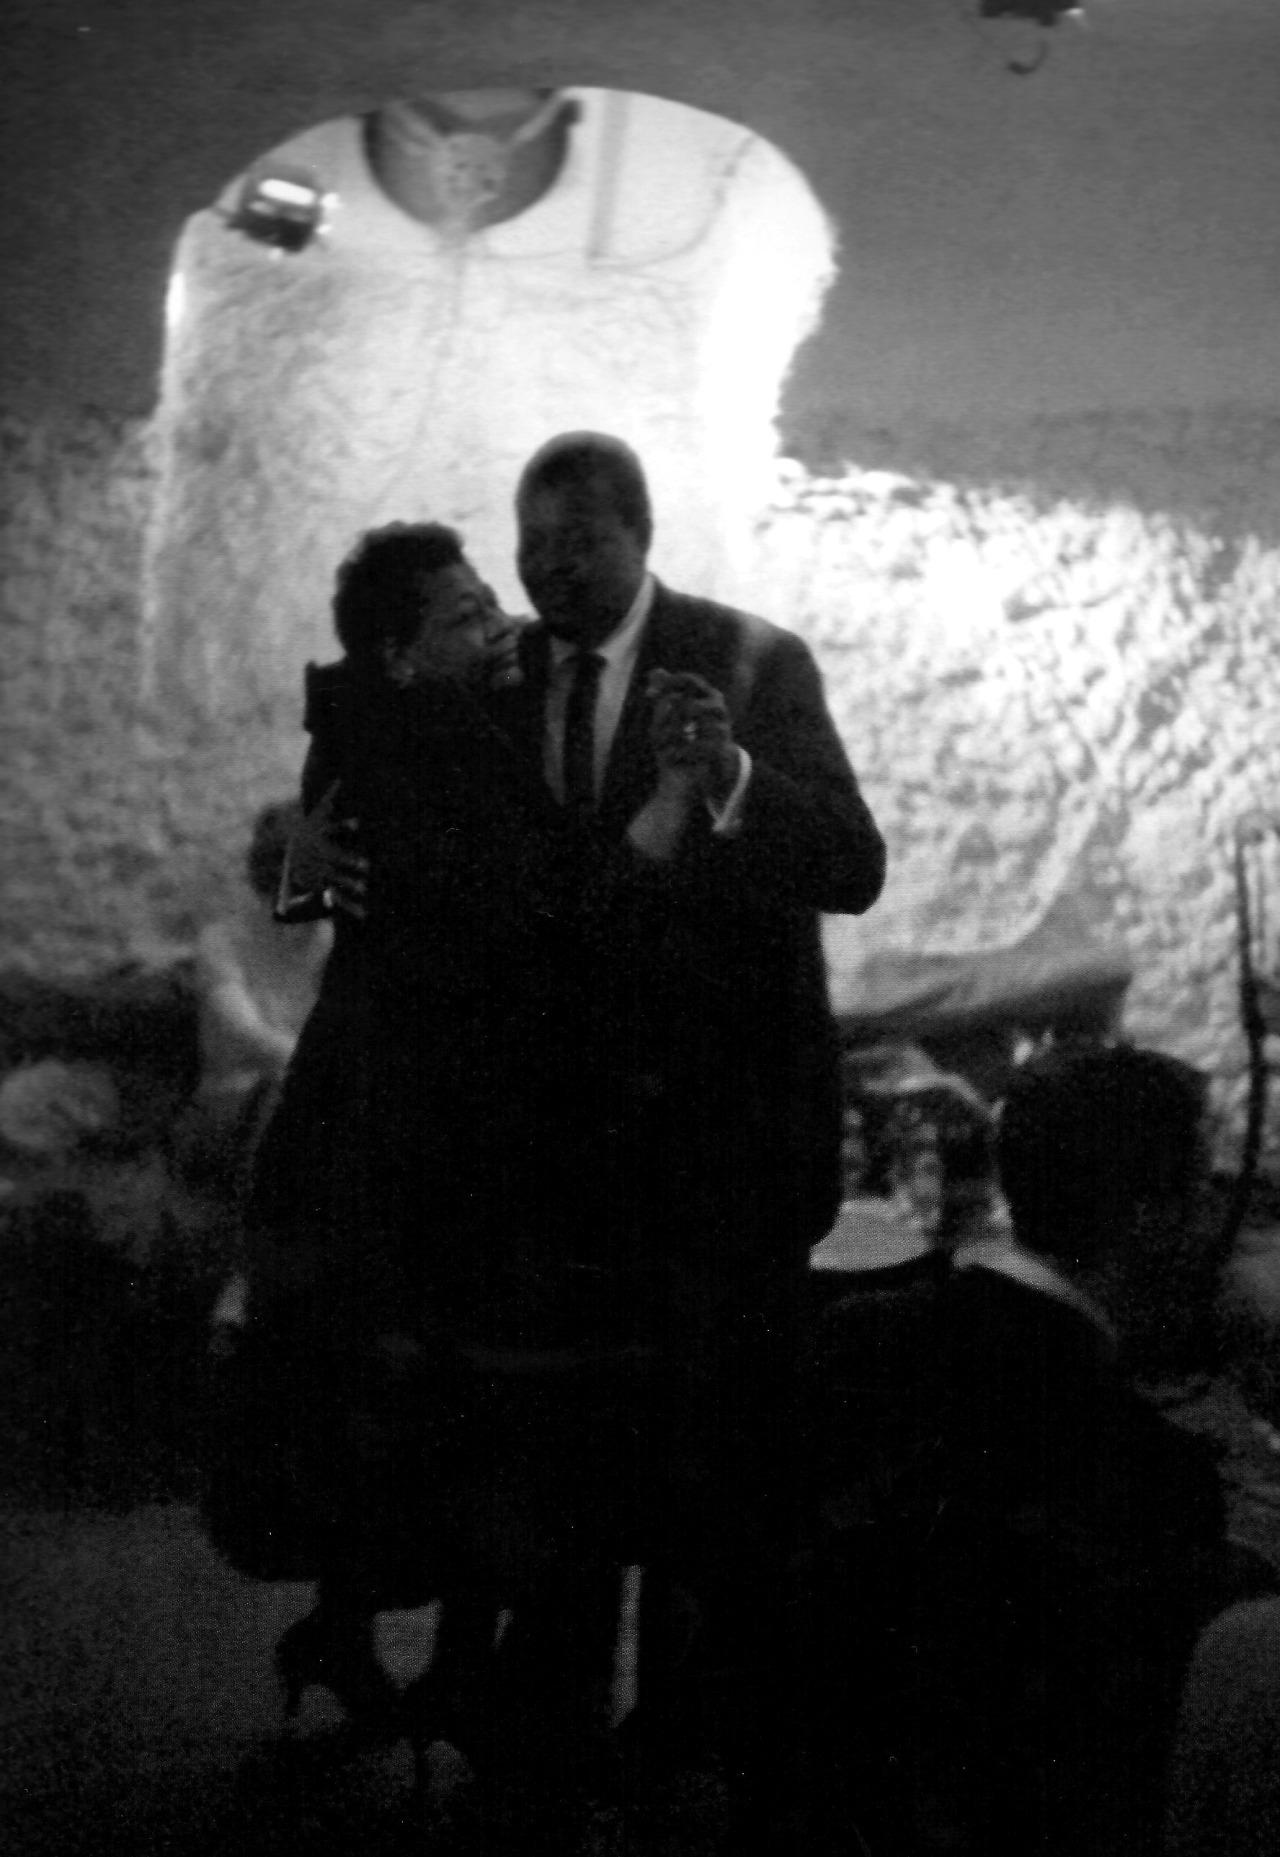 Ella Fitzgerald and Oscar Peterson dancing at Club Saint Germain, Paris, 1958; photographed by Herman Leonard.